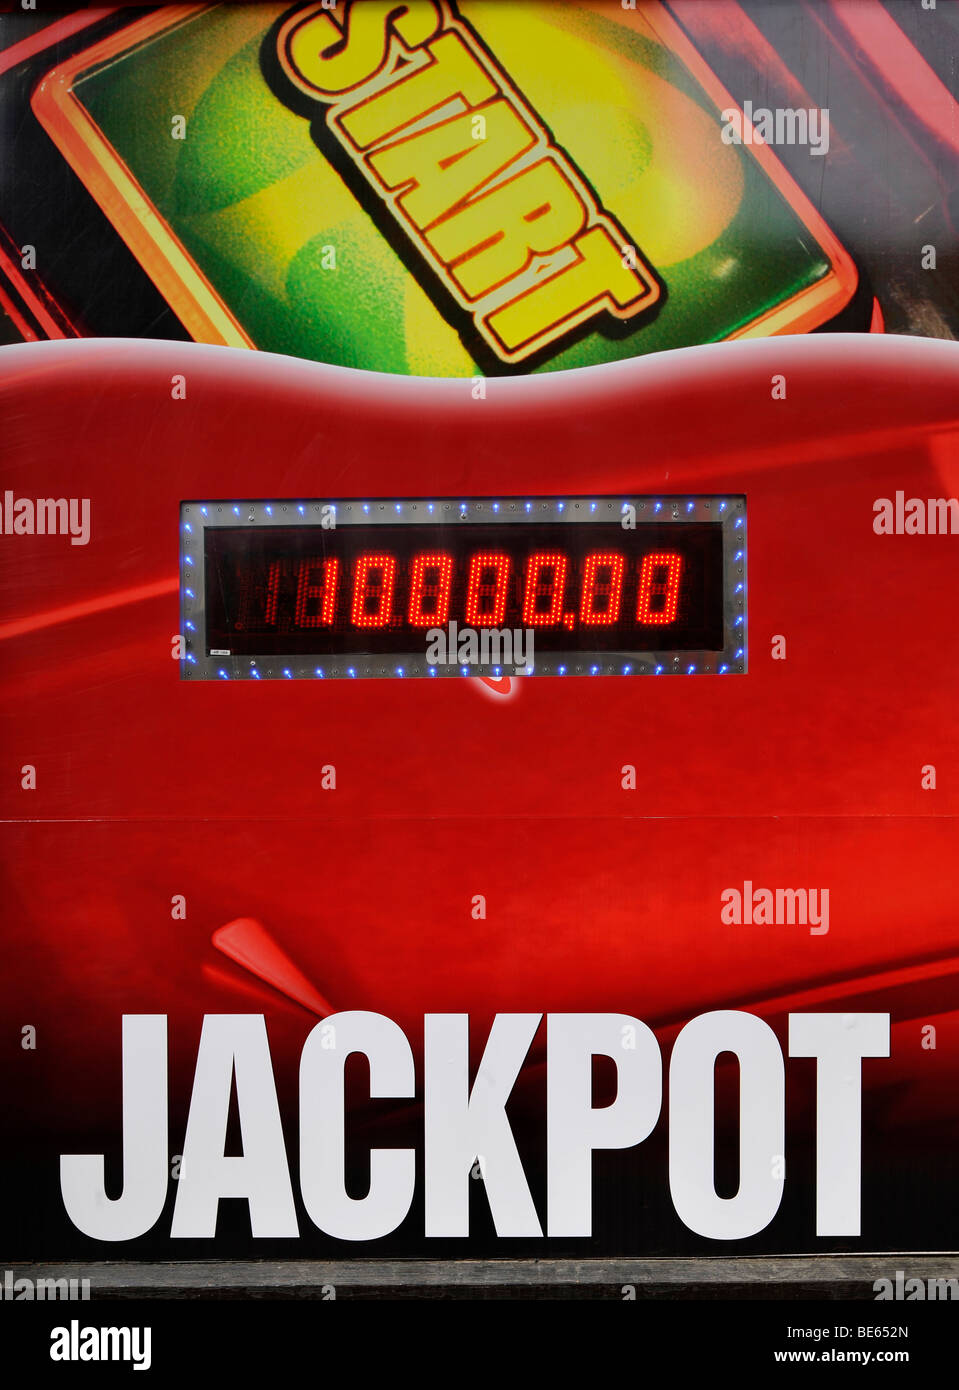 Jackpot, advertising in the casino, Ceske Budejovice, also Bohemian Budweis, Budvar, Bohemia, Czech Republic, Europe - Stock Image